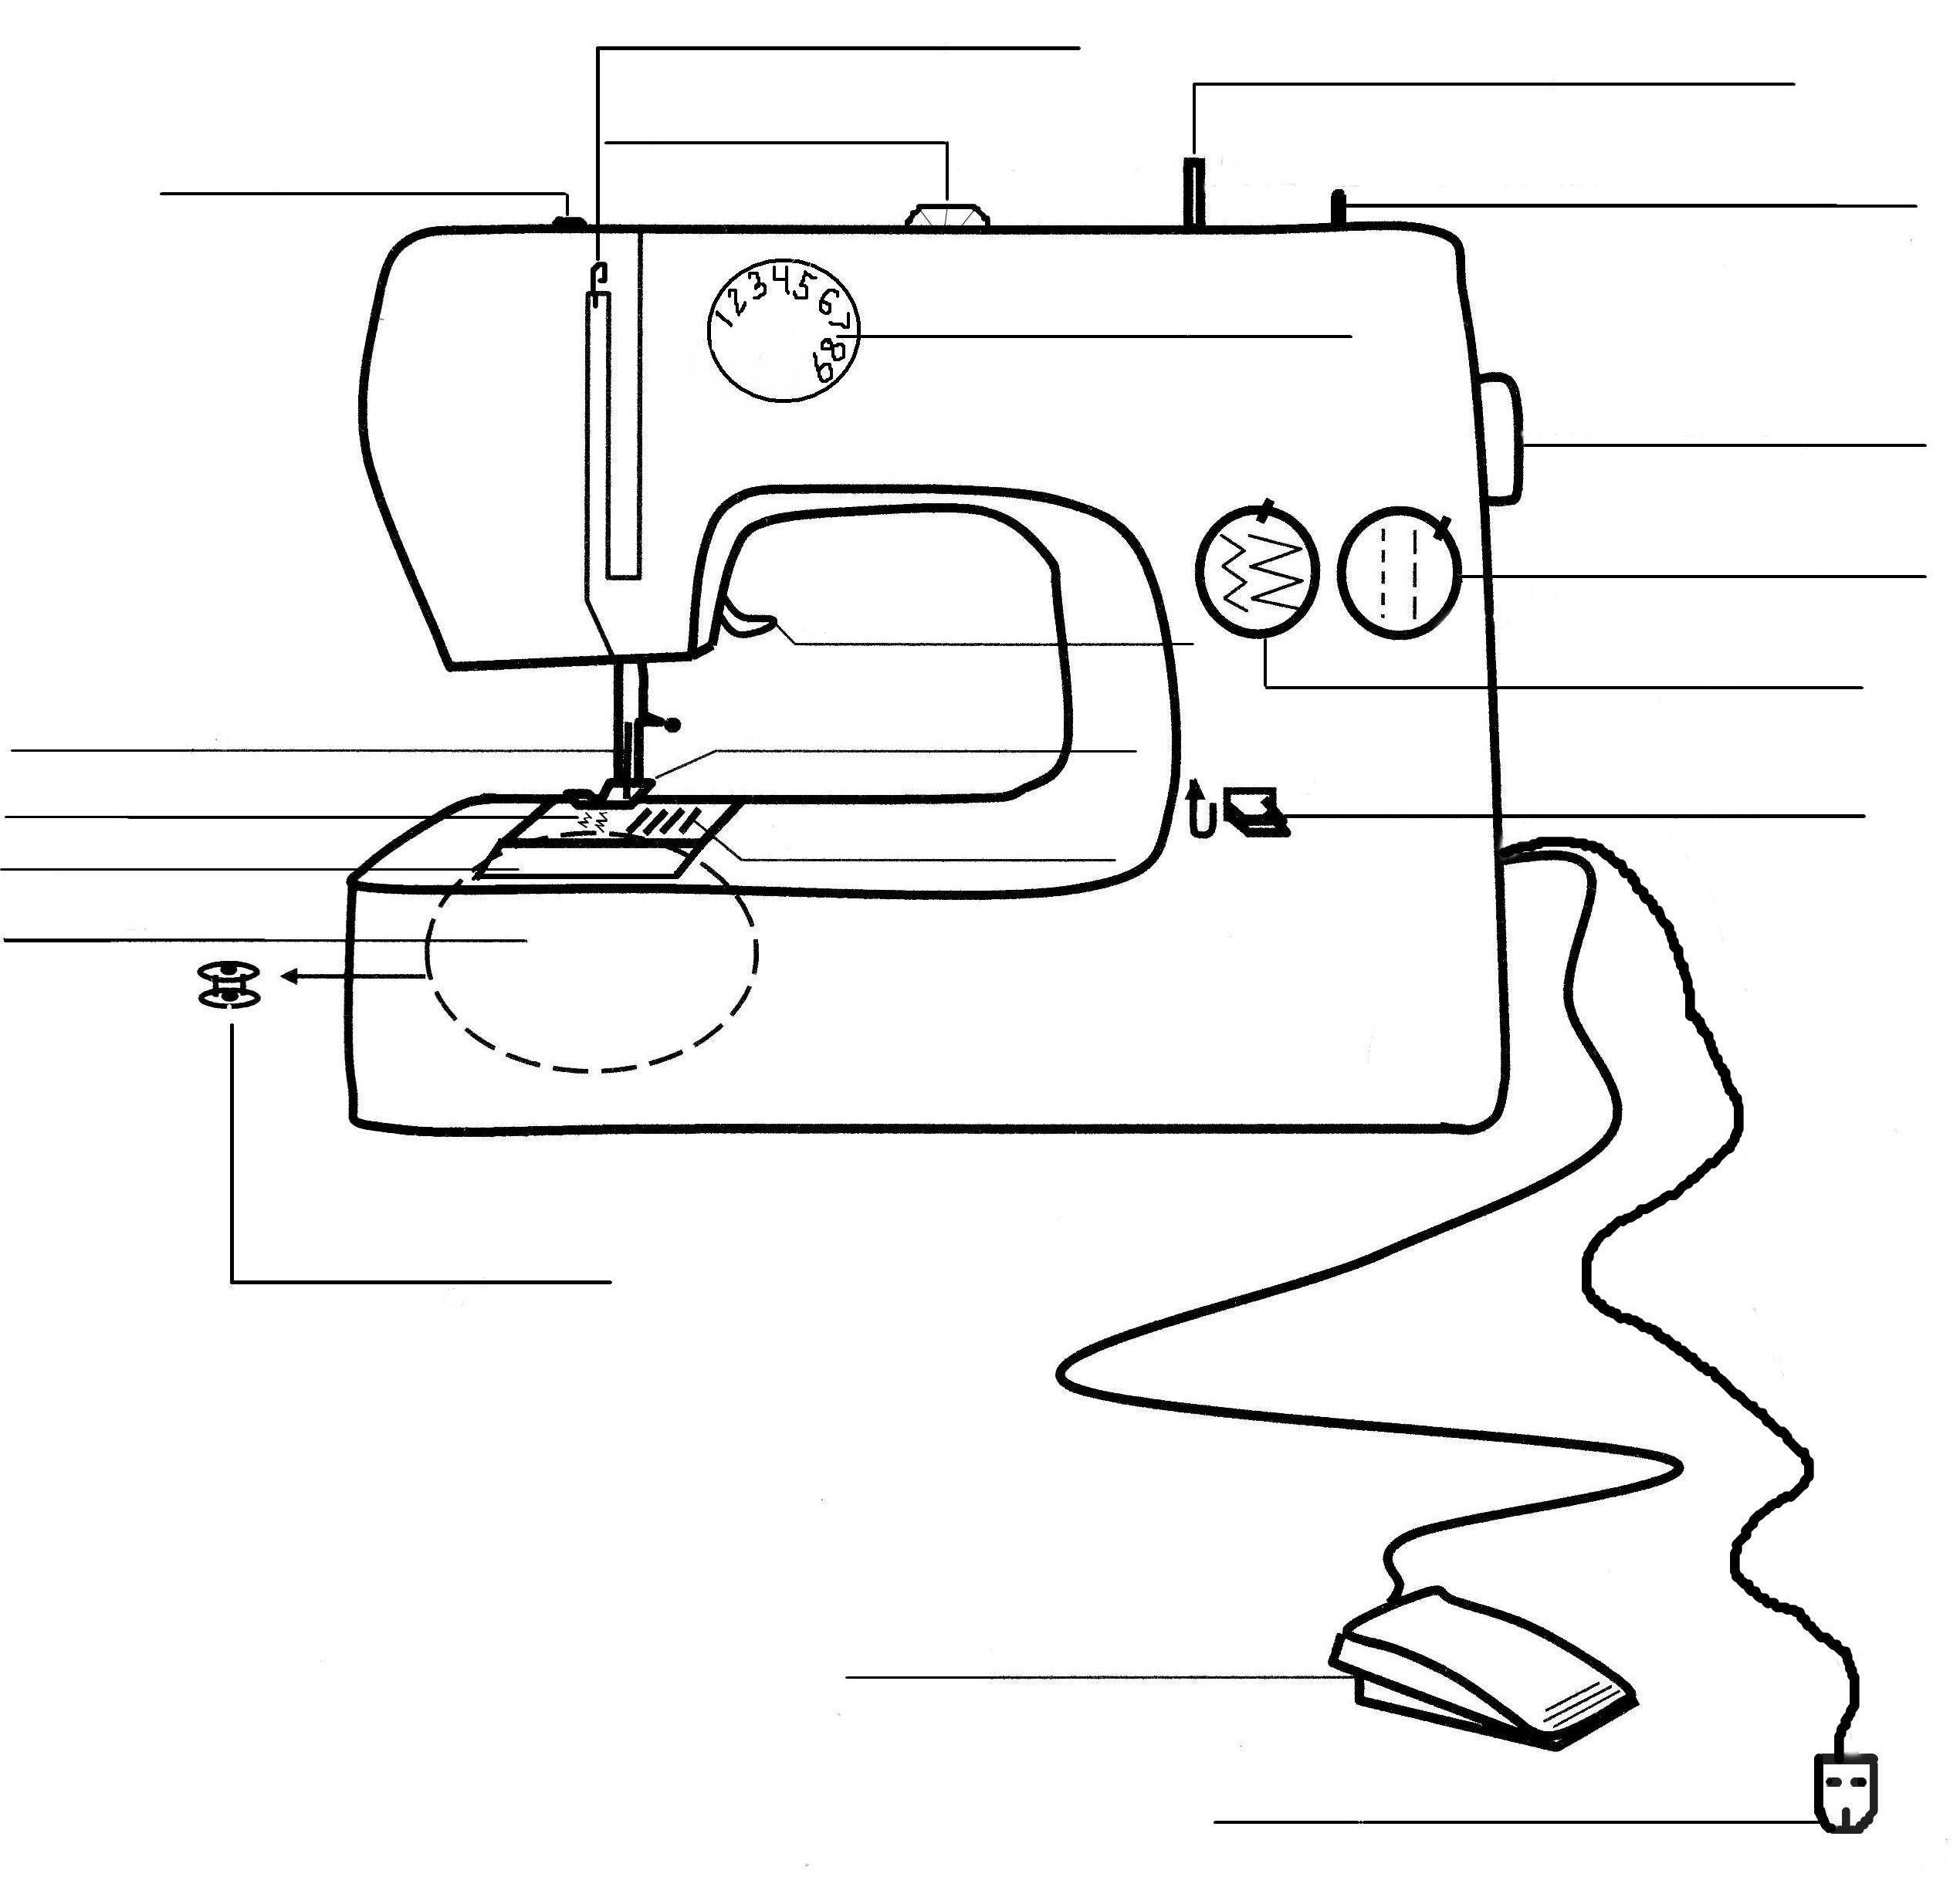 sewing machine diagram worksheet